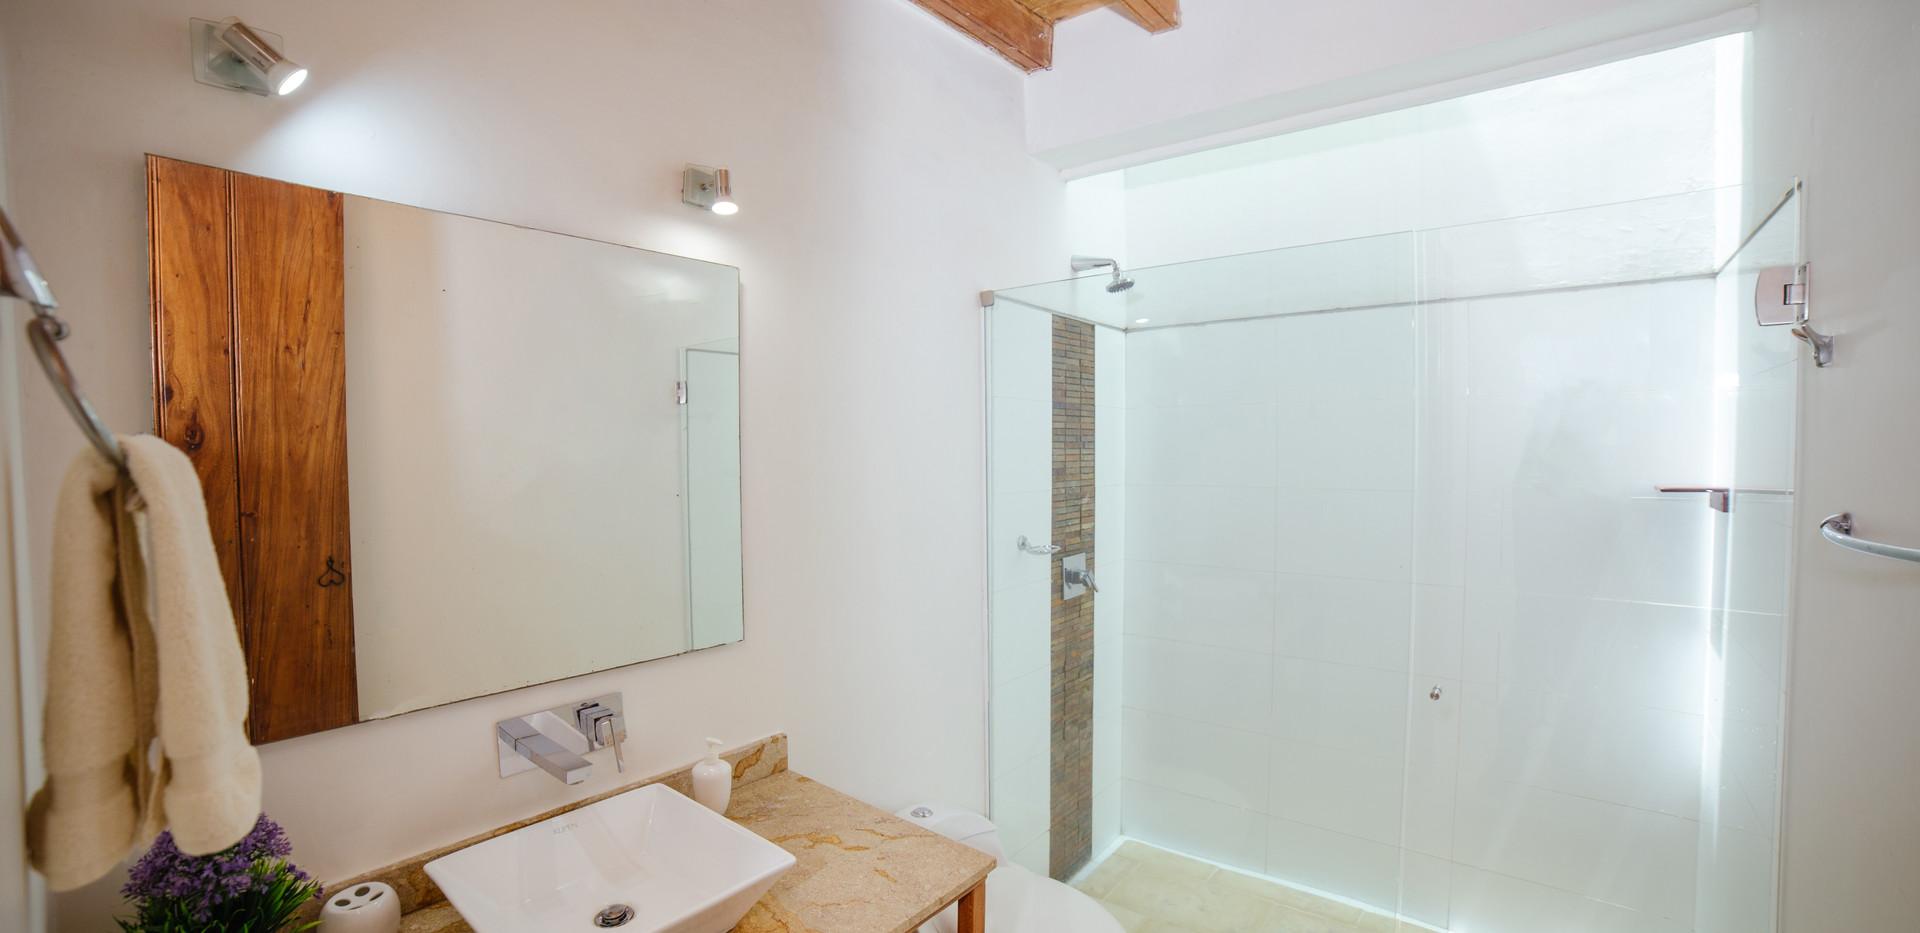 BIOMA SUPERIOR DOUBLE ROOM - BATHROOM